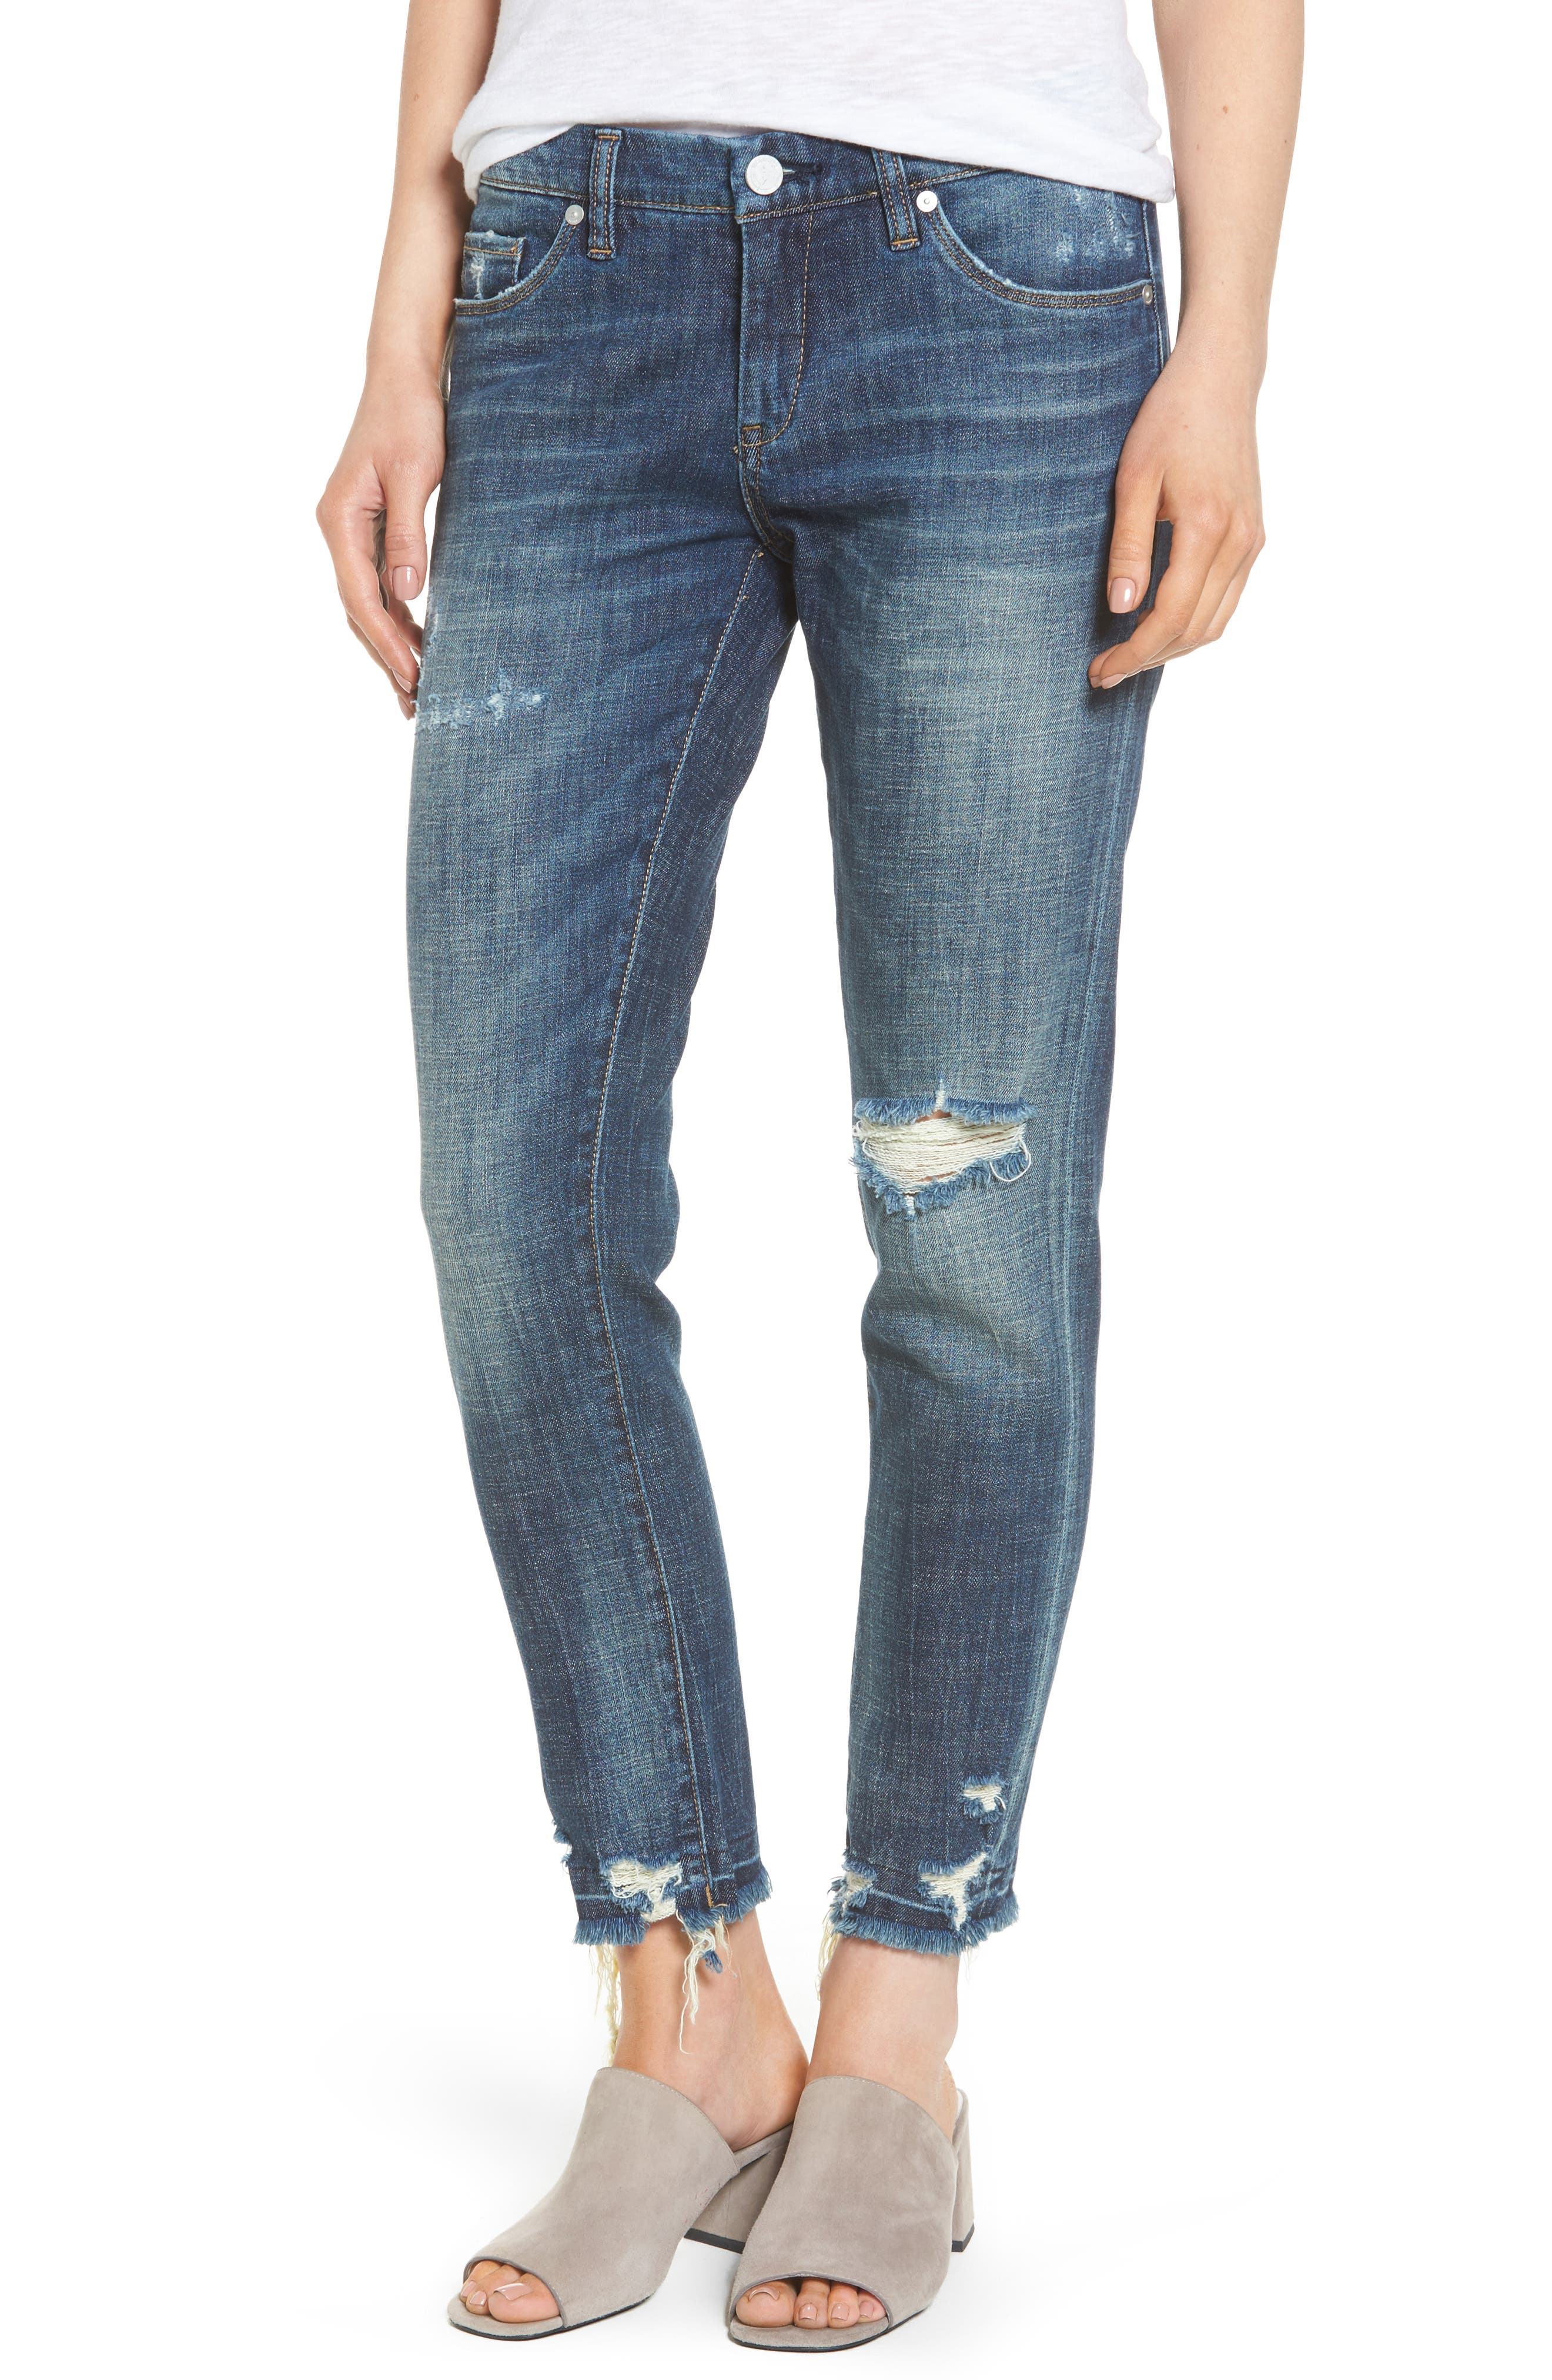 Alternate Image 1 Selected - BLANKNYC Ripped Girlfriend Jeans (Let It Roll)